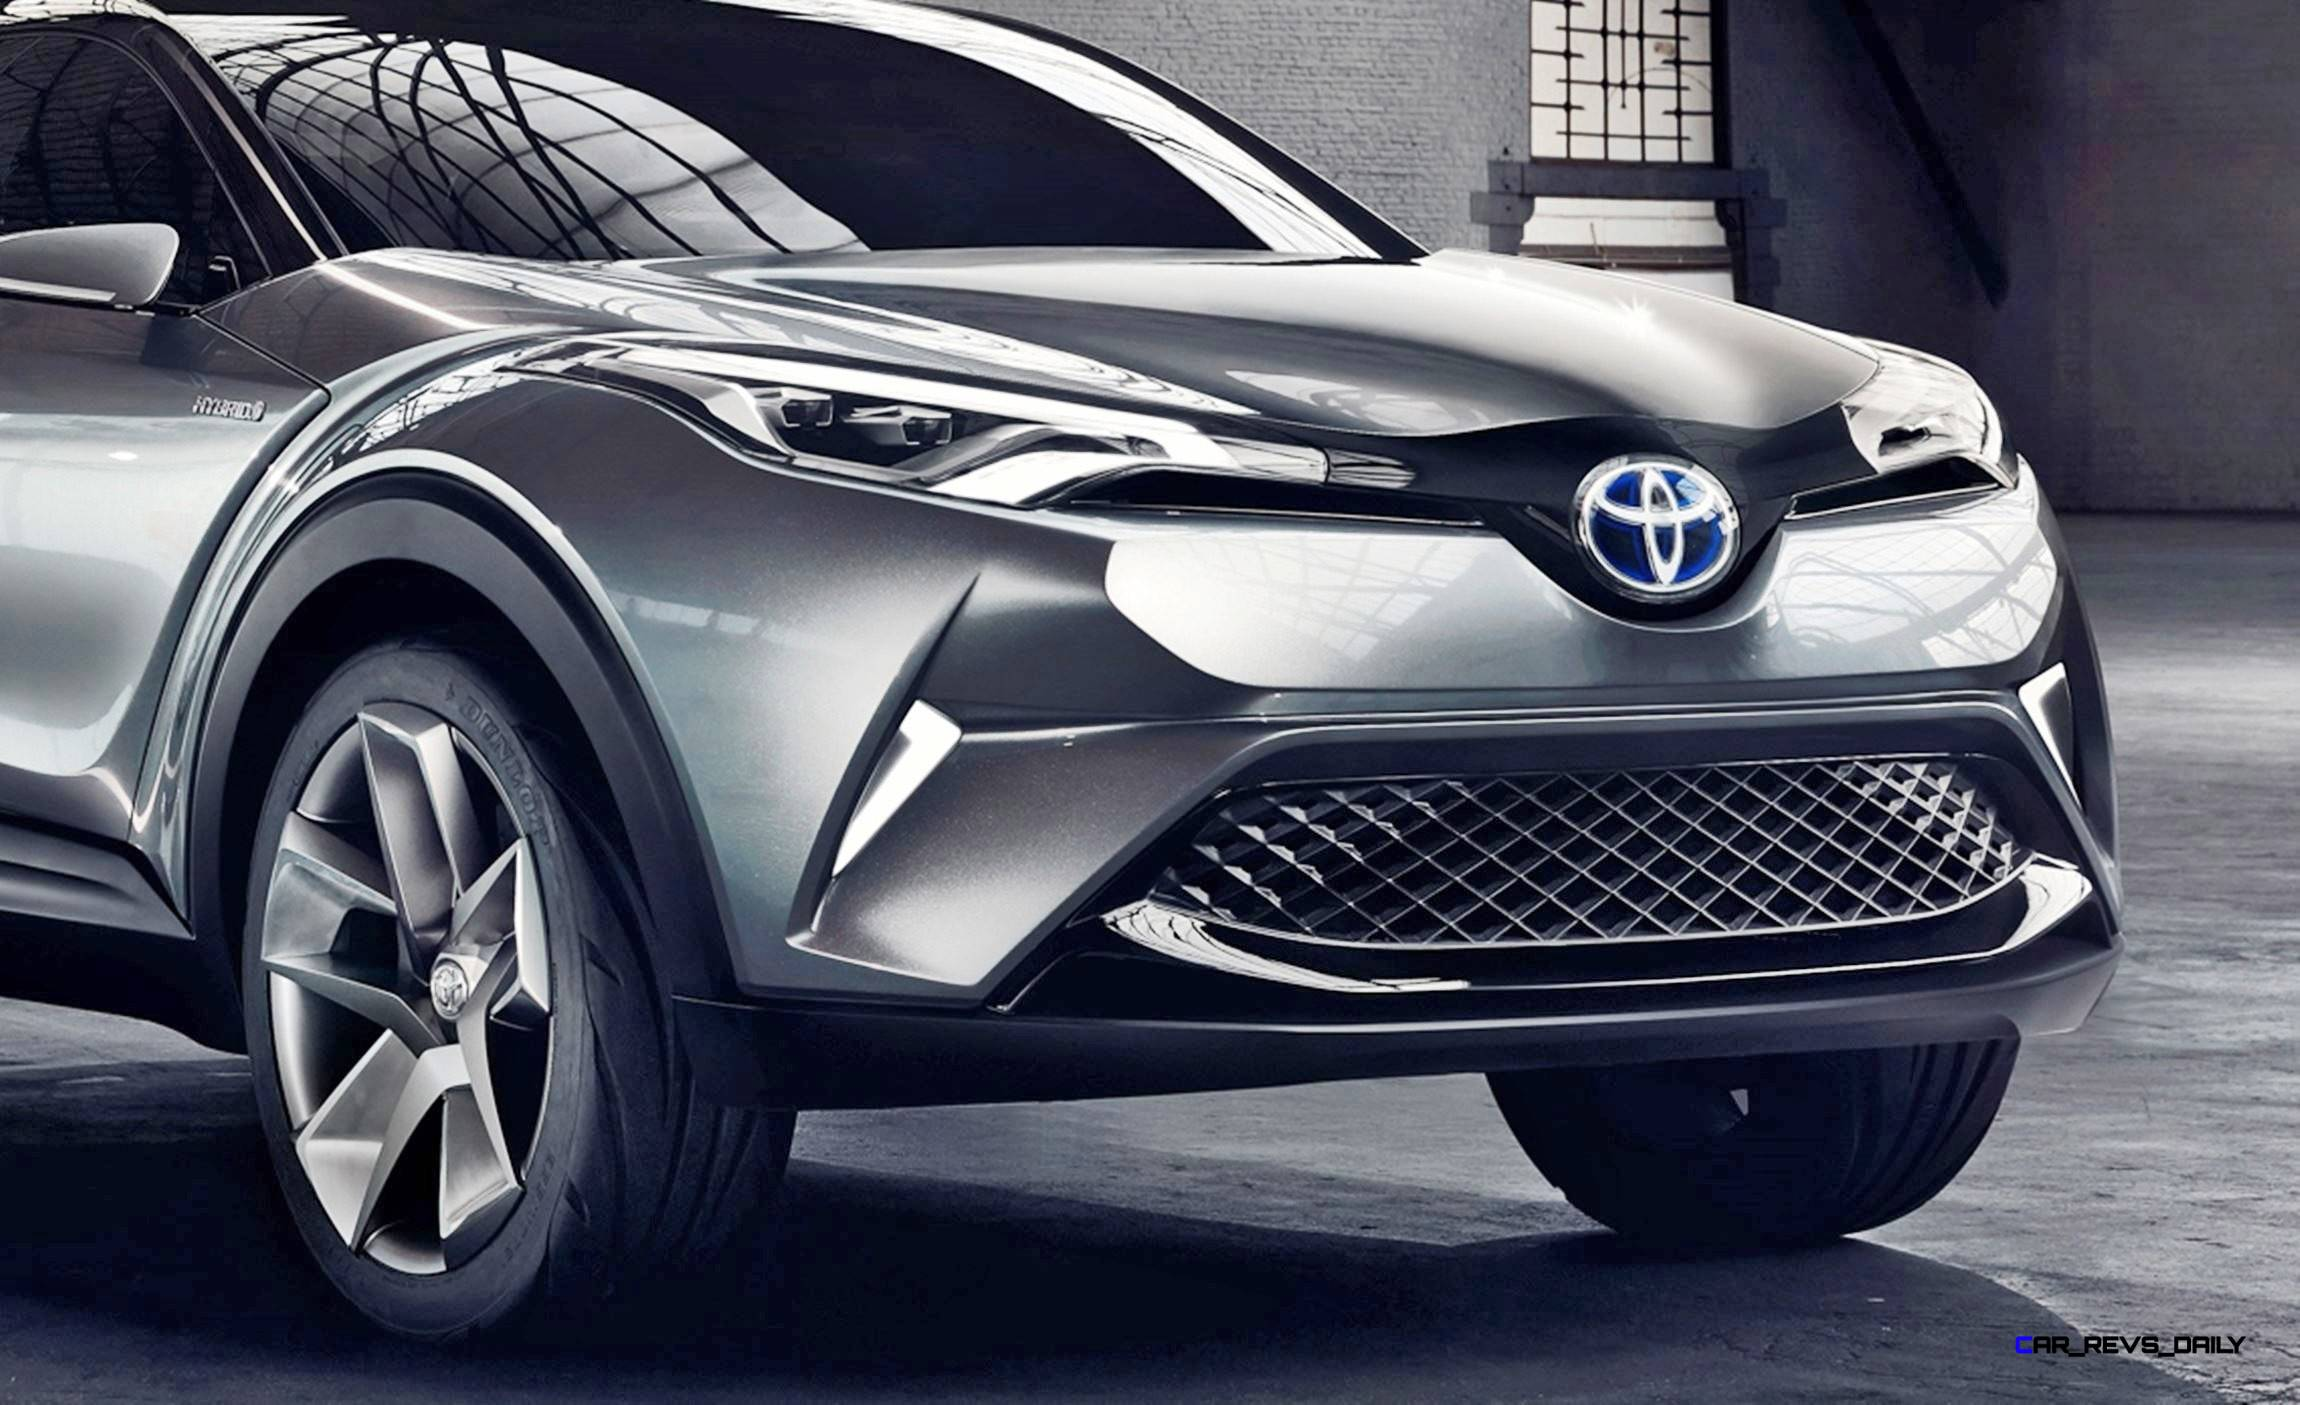 2015 Toyota C Hr Concept Updated As 4 Door Production